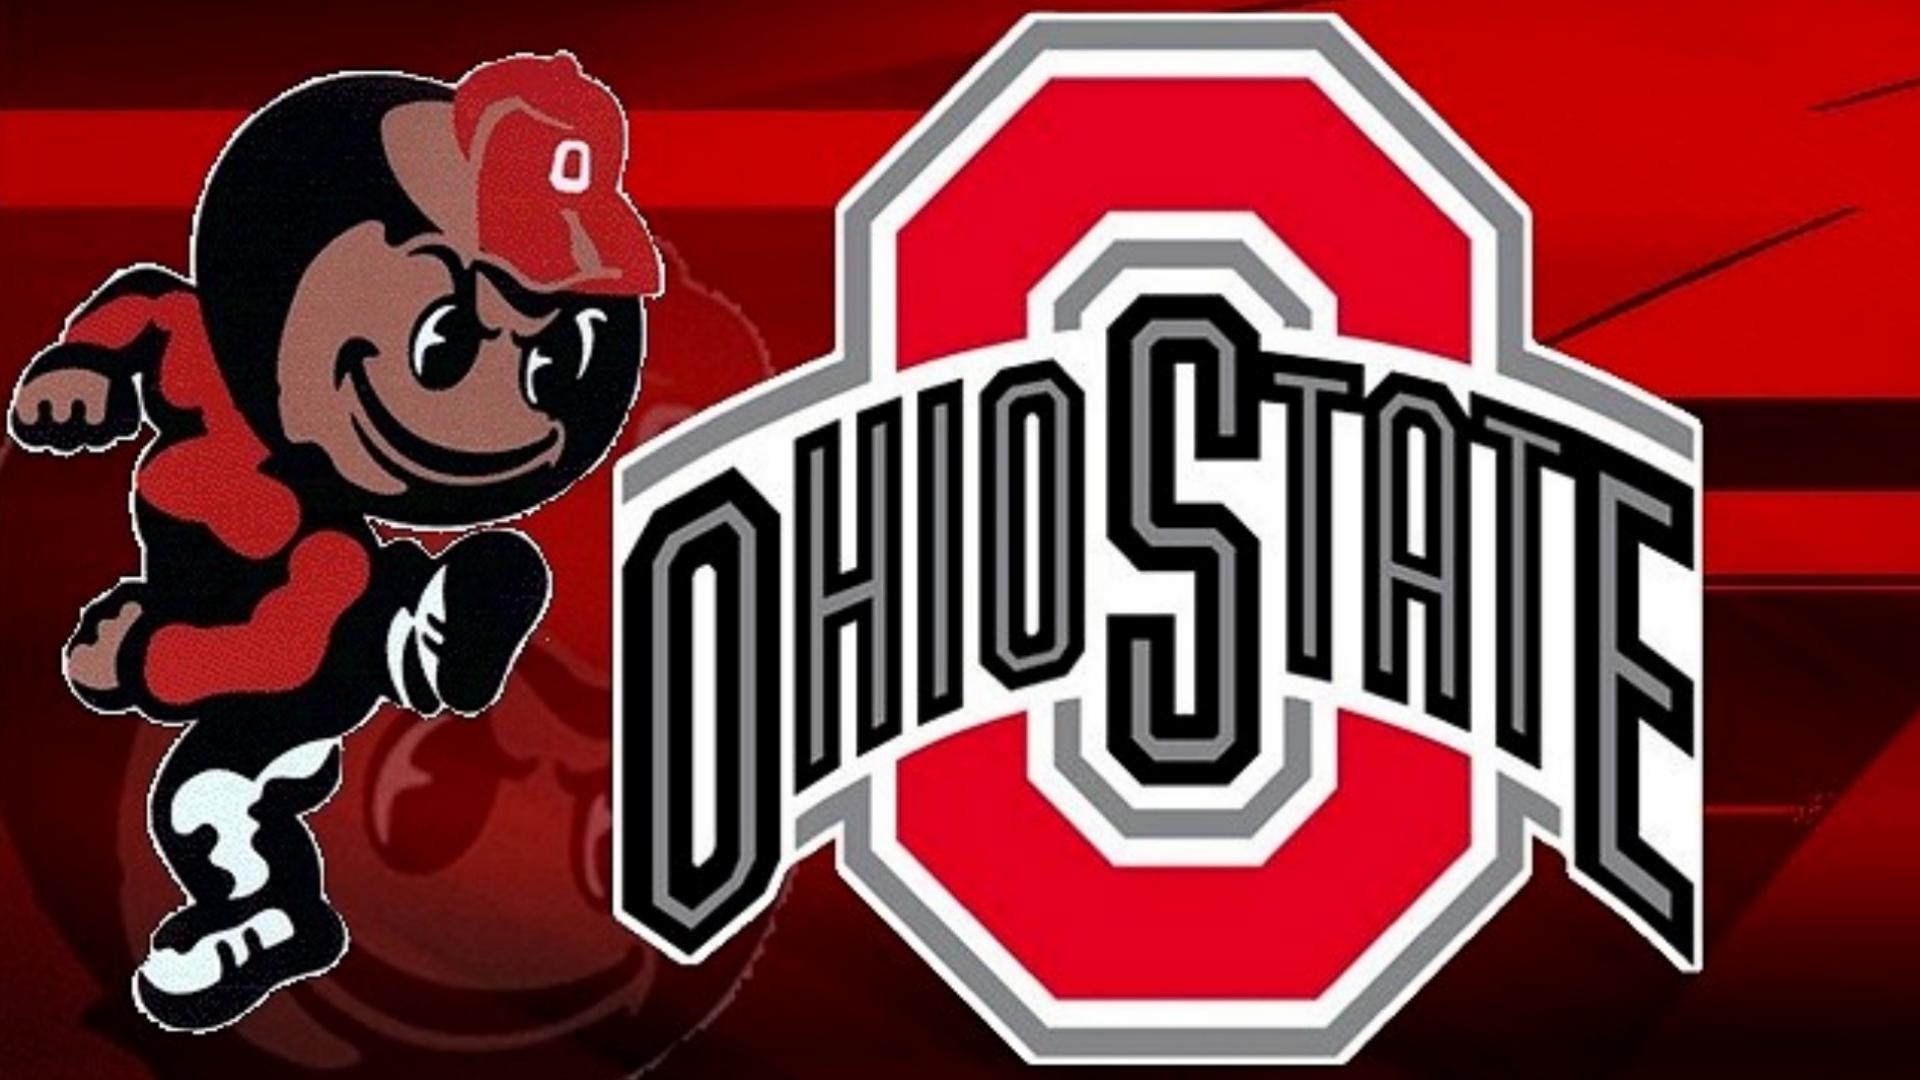 BLOCK O OHIO STATE   Ohio State Football Wallpaper 29090309 1920x1080